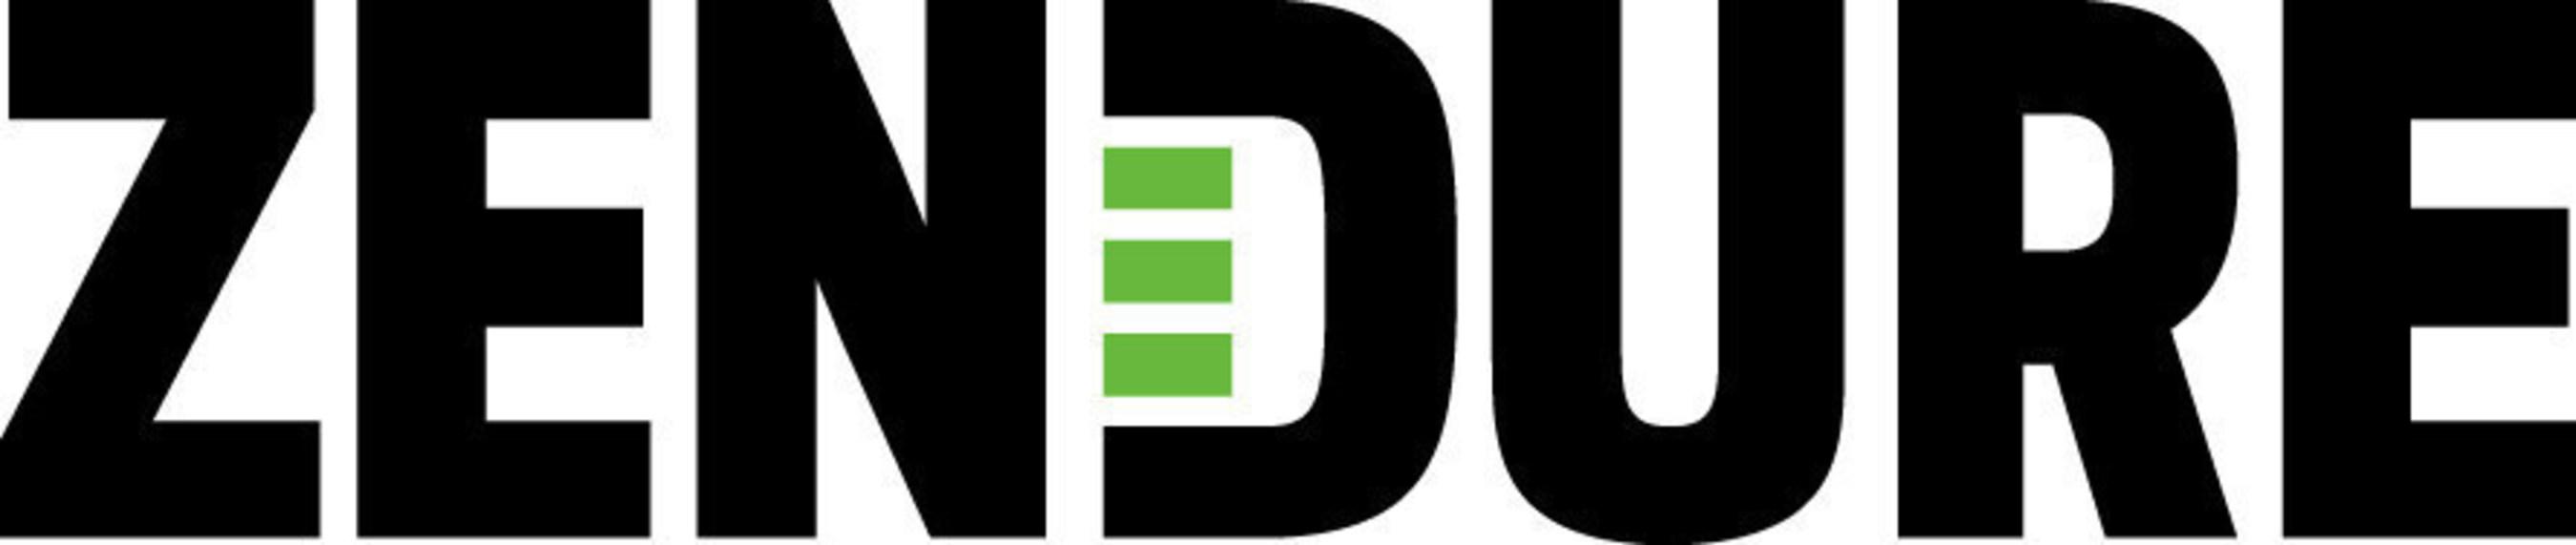 Zendure Official Logo